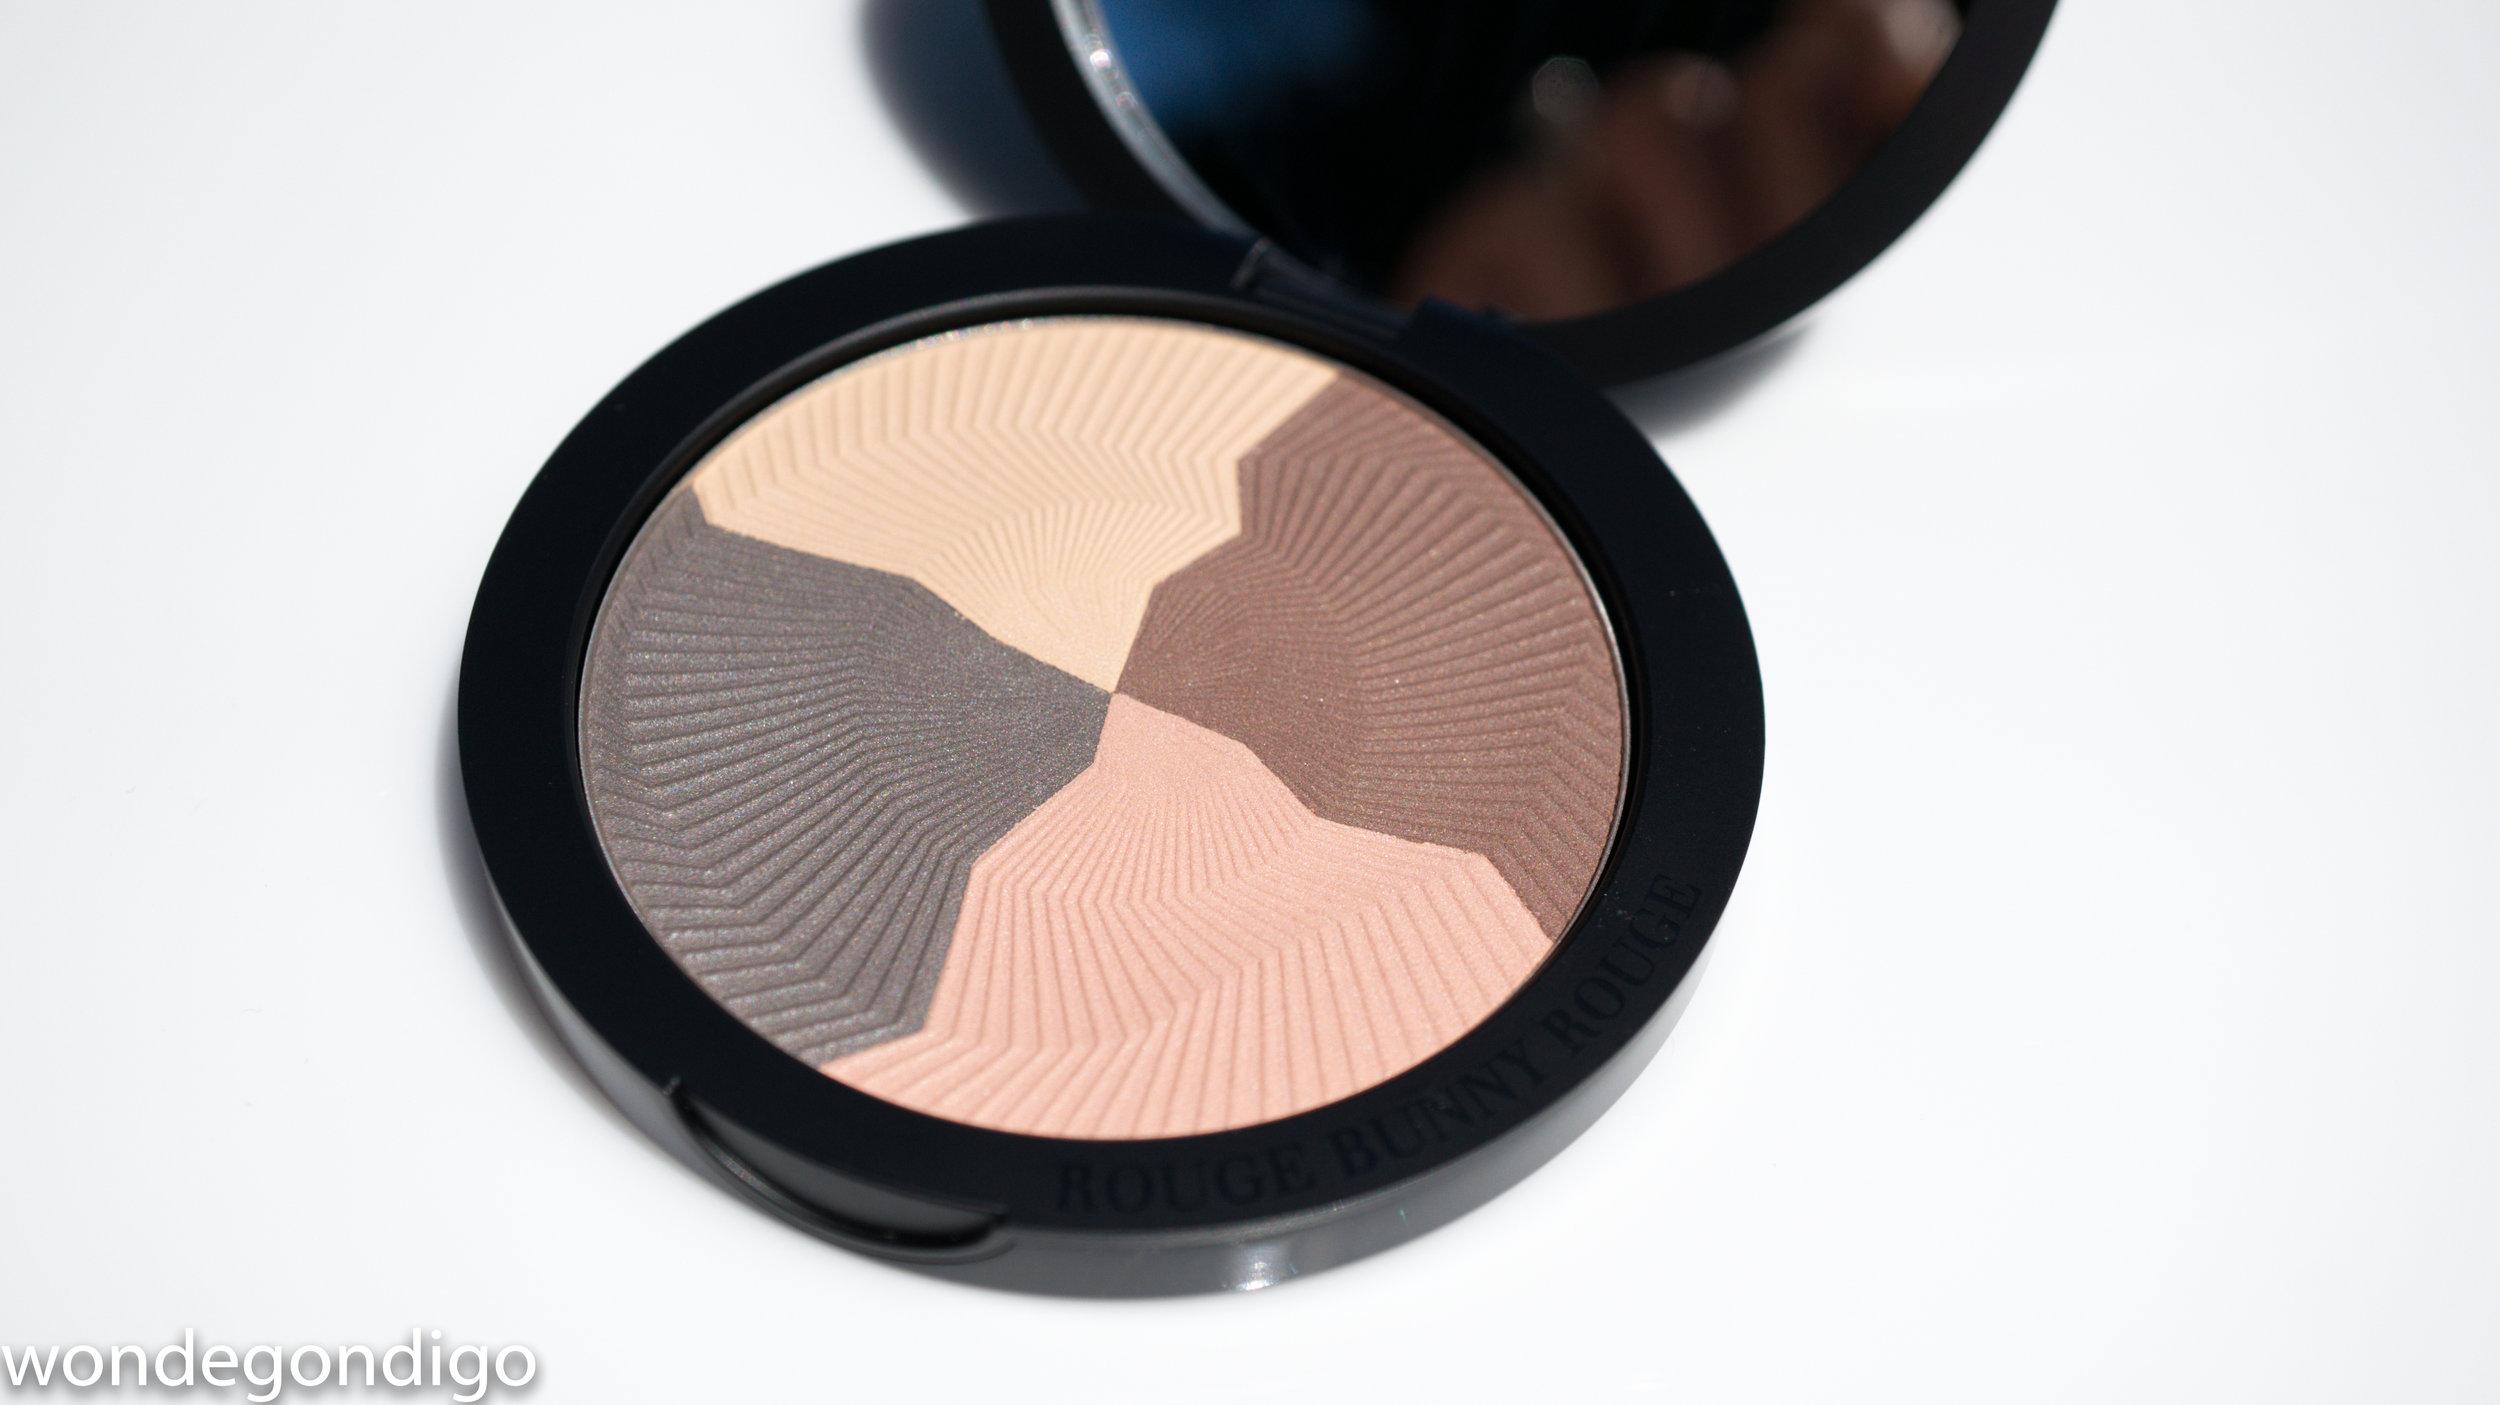 Rouge Bunny Rouge Raw Garden Eye Shadow Palette in Loess